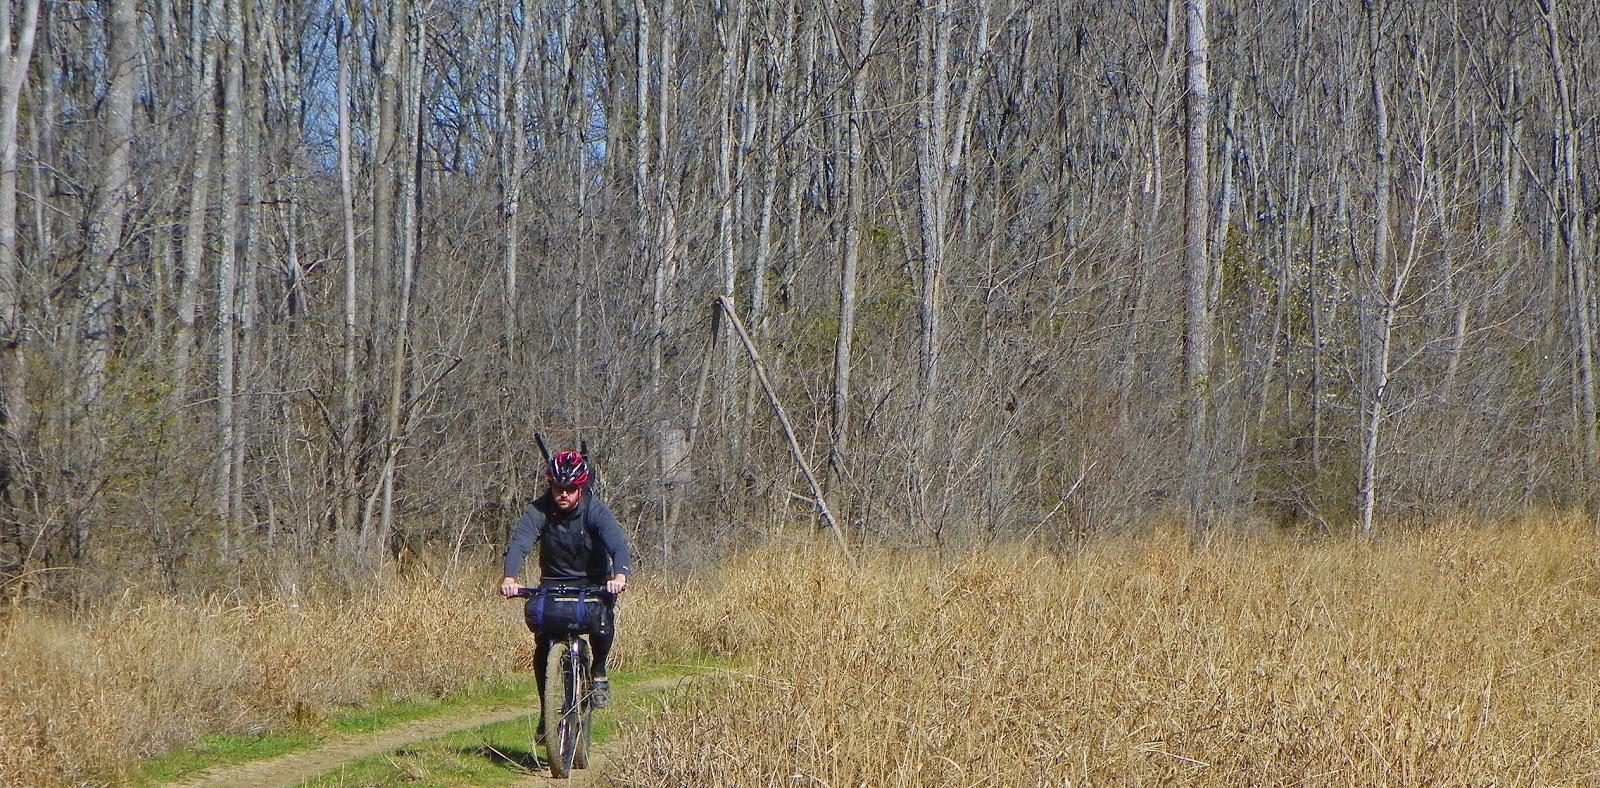 Dallas Trinity Trails Bike Rafting The Trinity River And Mountain